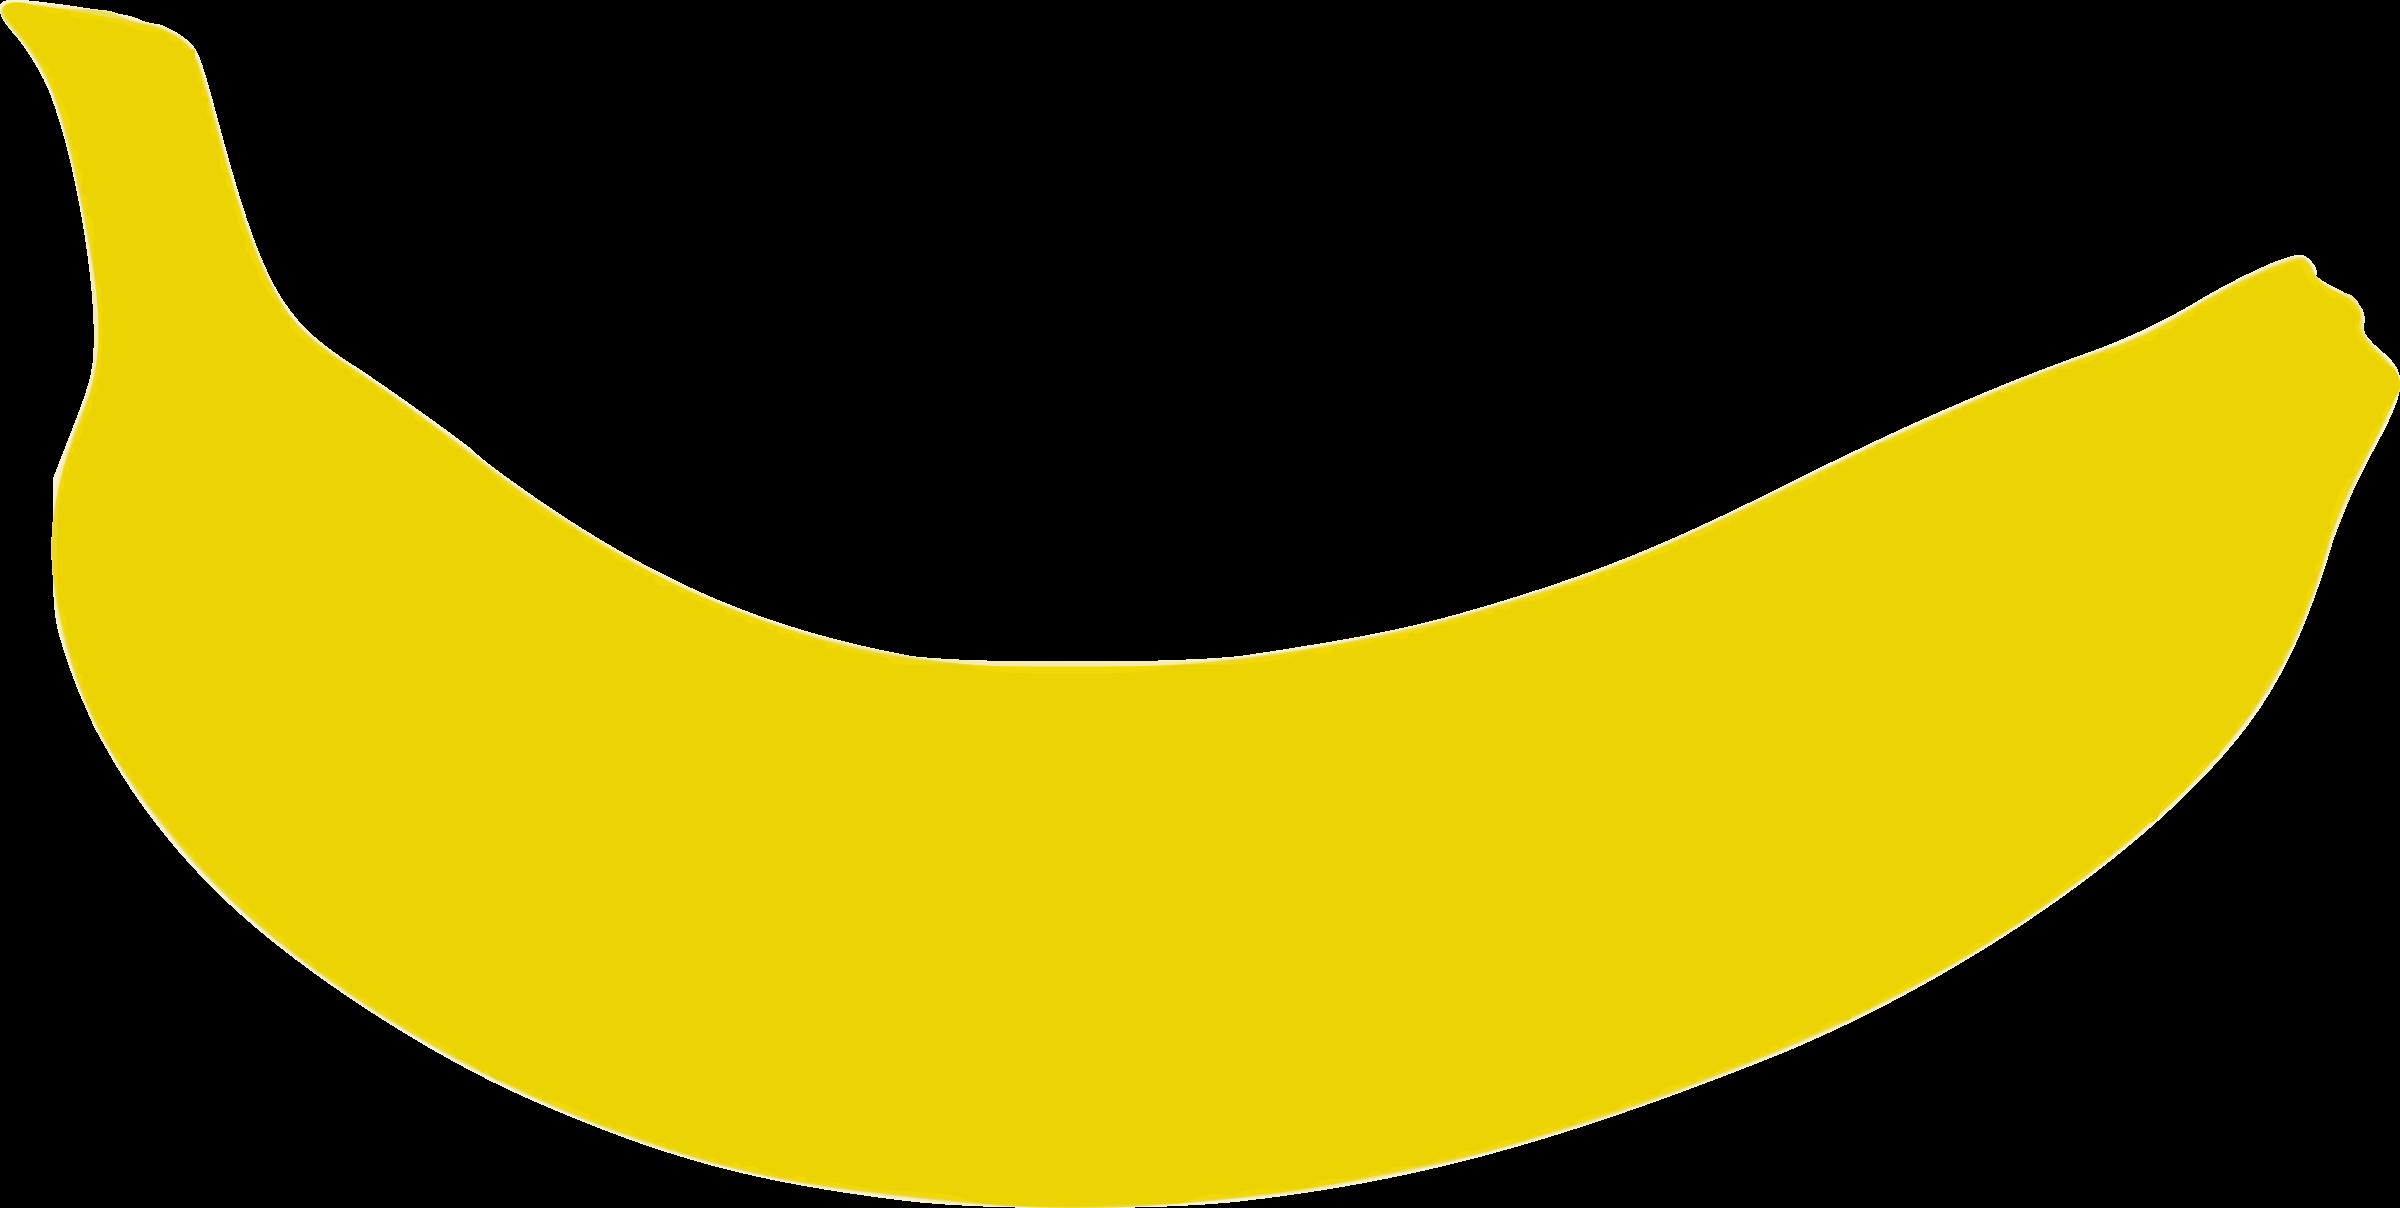 Silhouette at getdrawings com. Clipart people banana